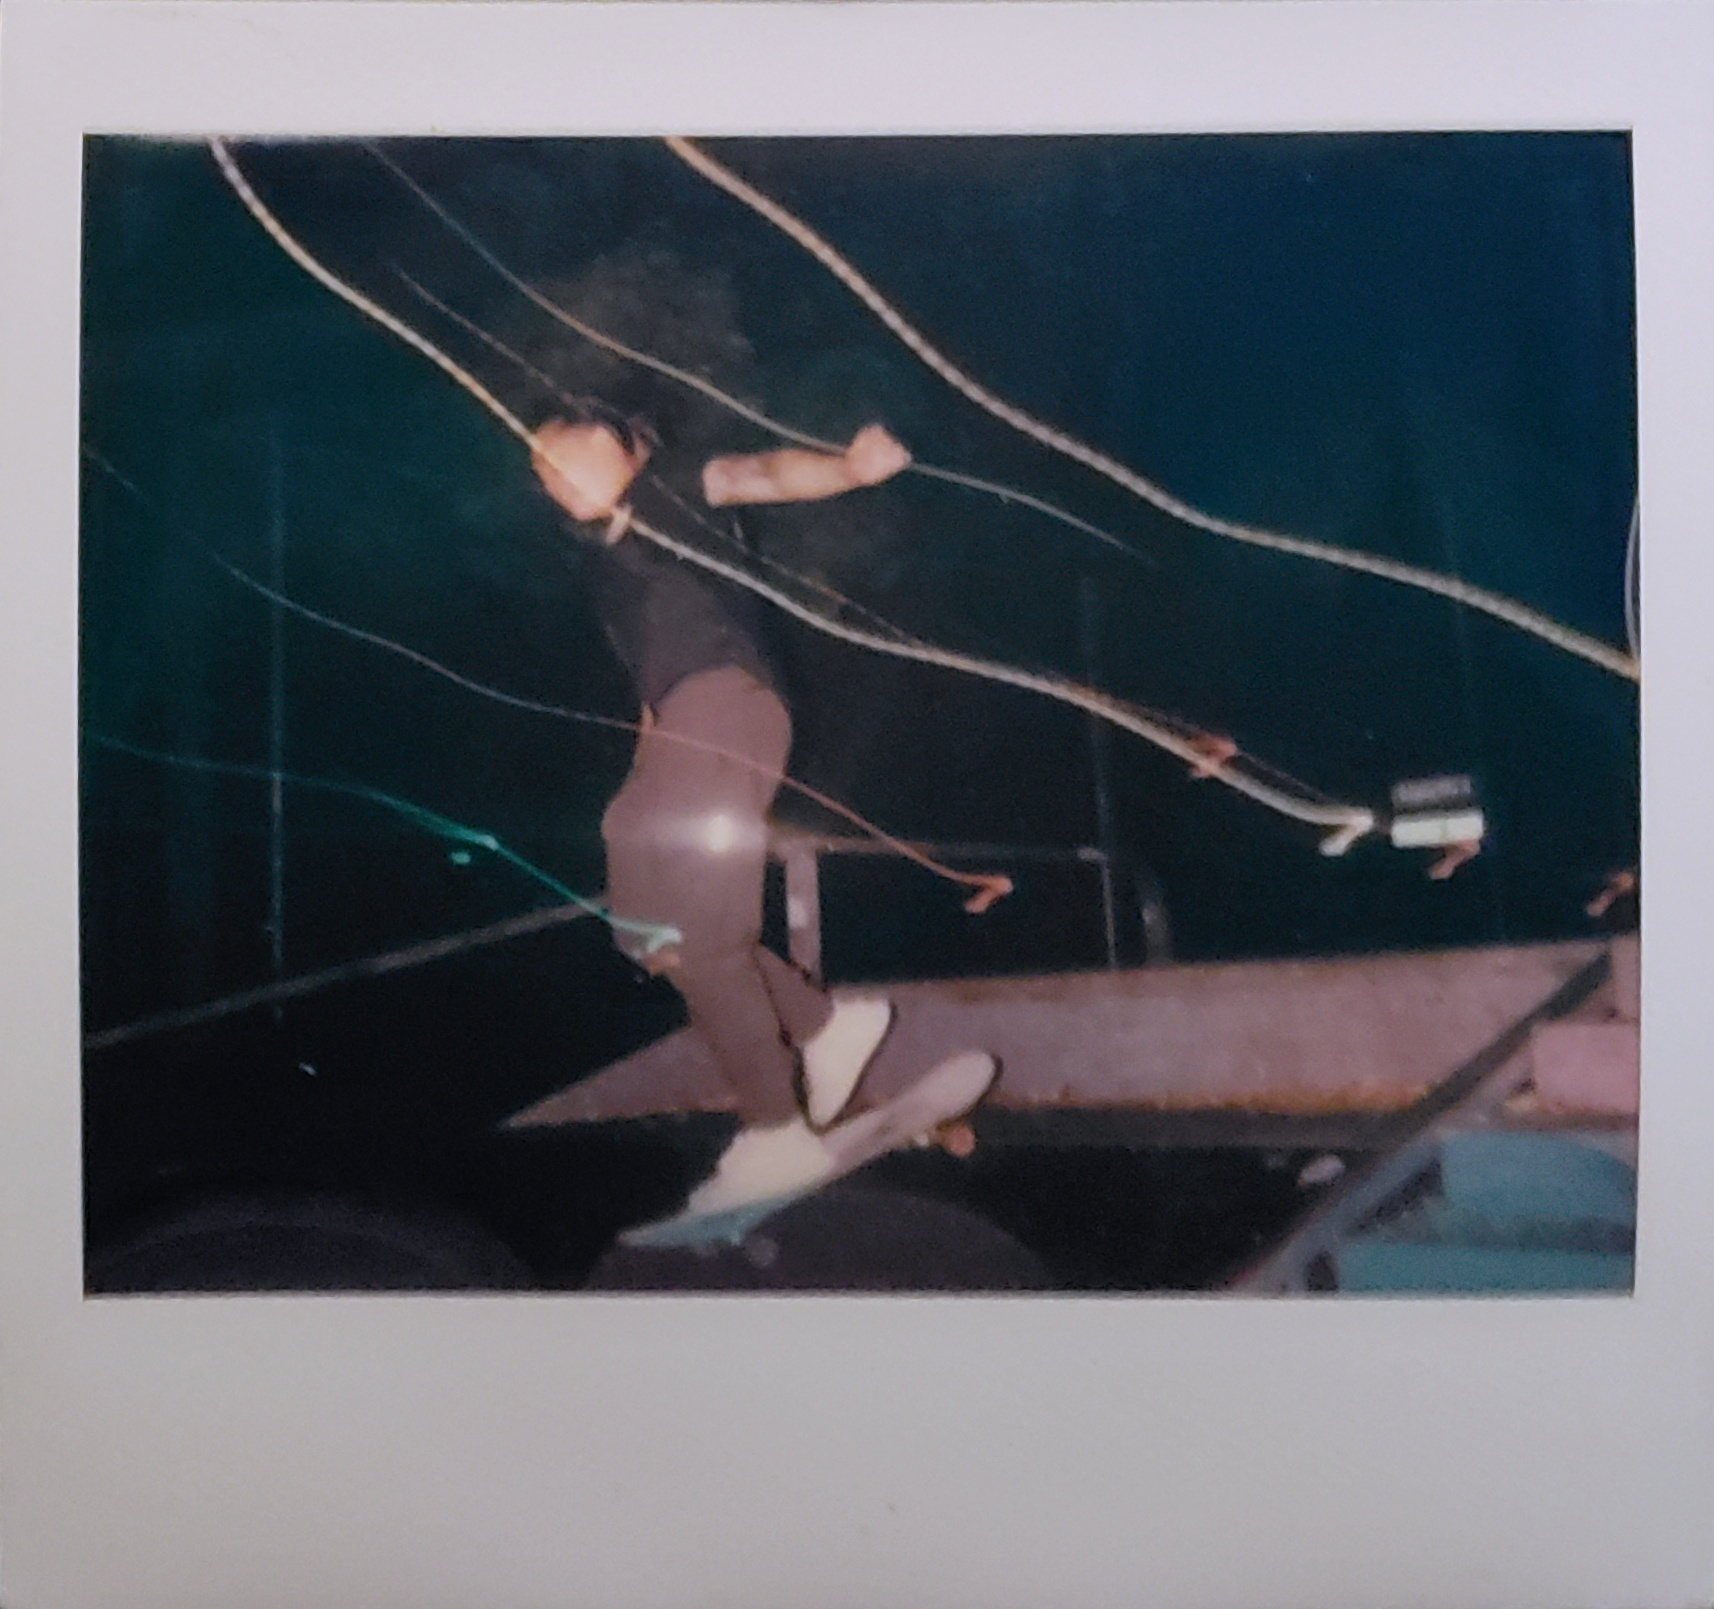 Alex Phommahasay  | summersesh | Polaroid Spectra